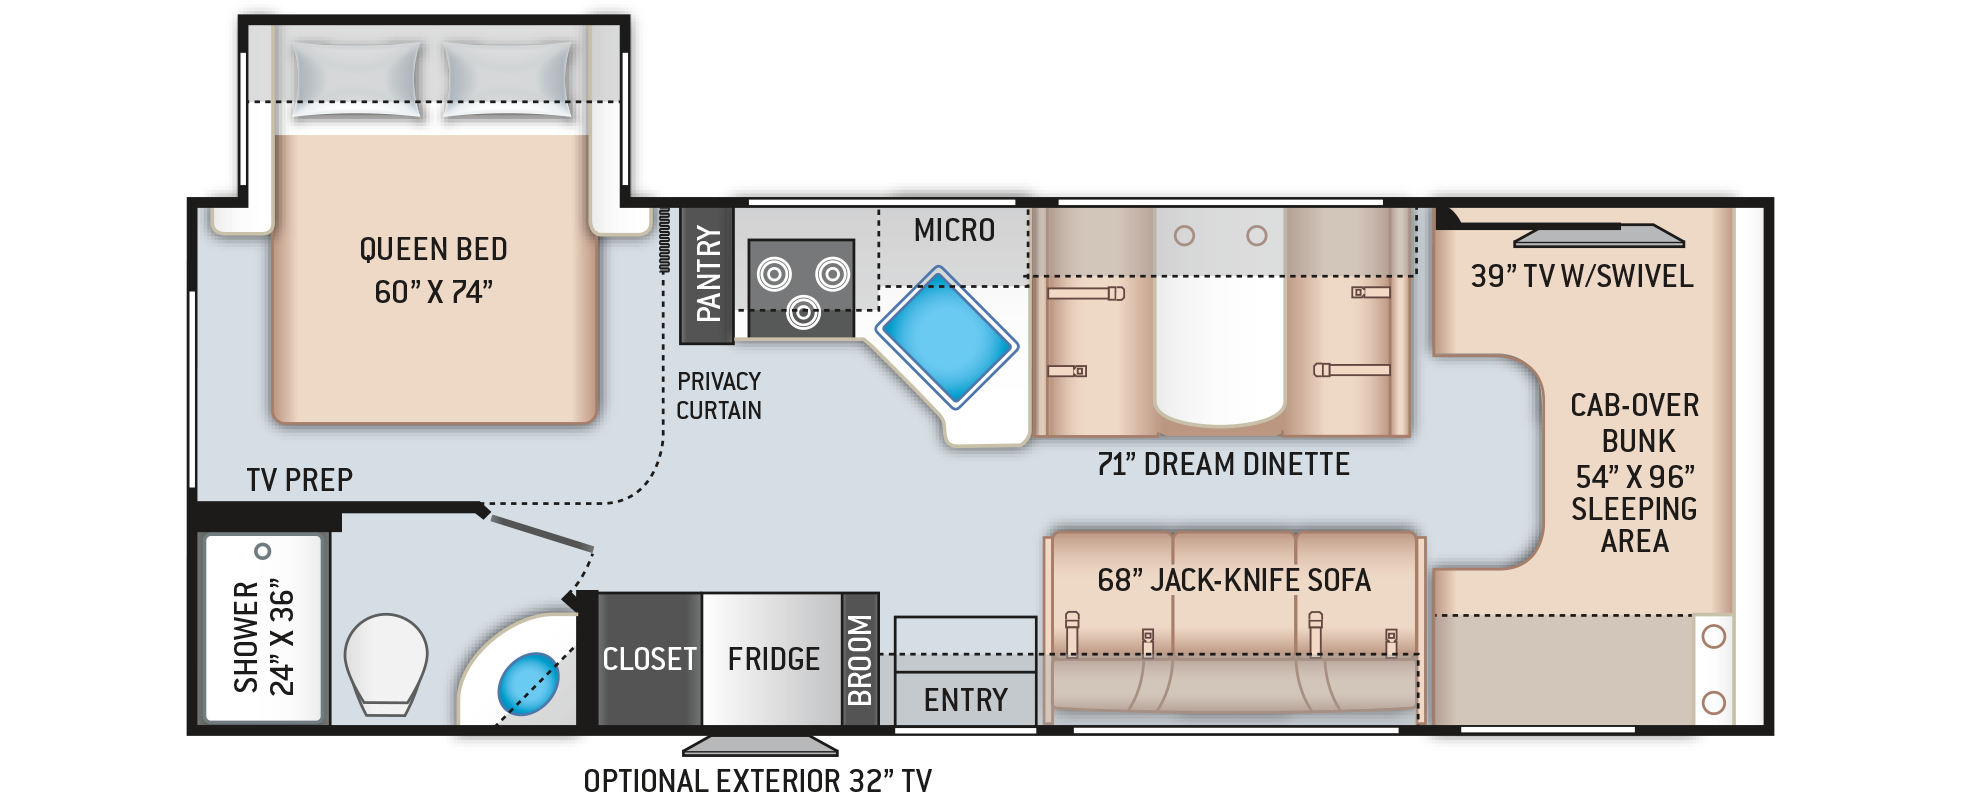 Daybreak Class C Motorhome 26DB Floor Plan